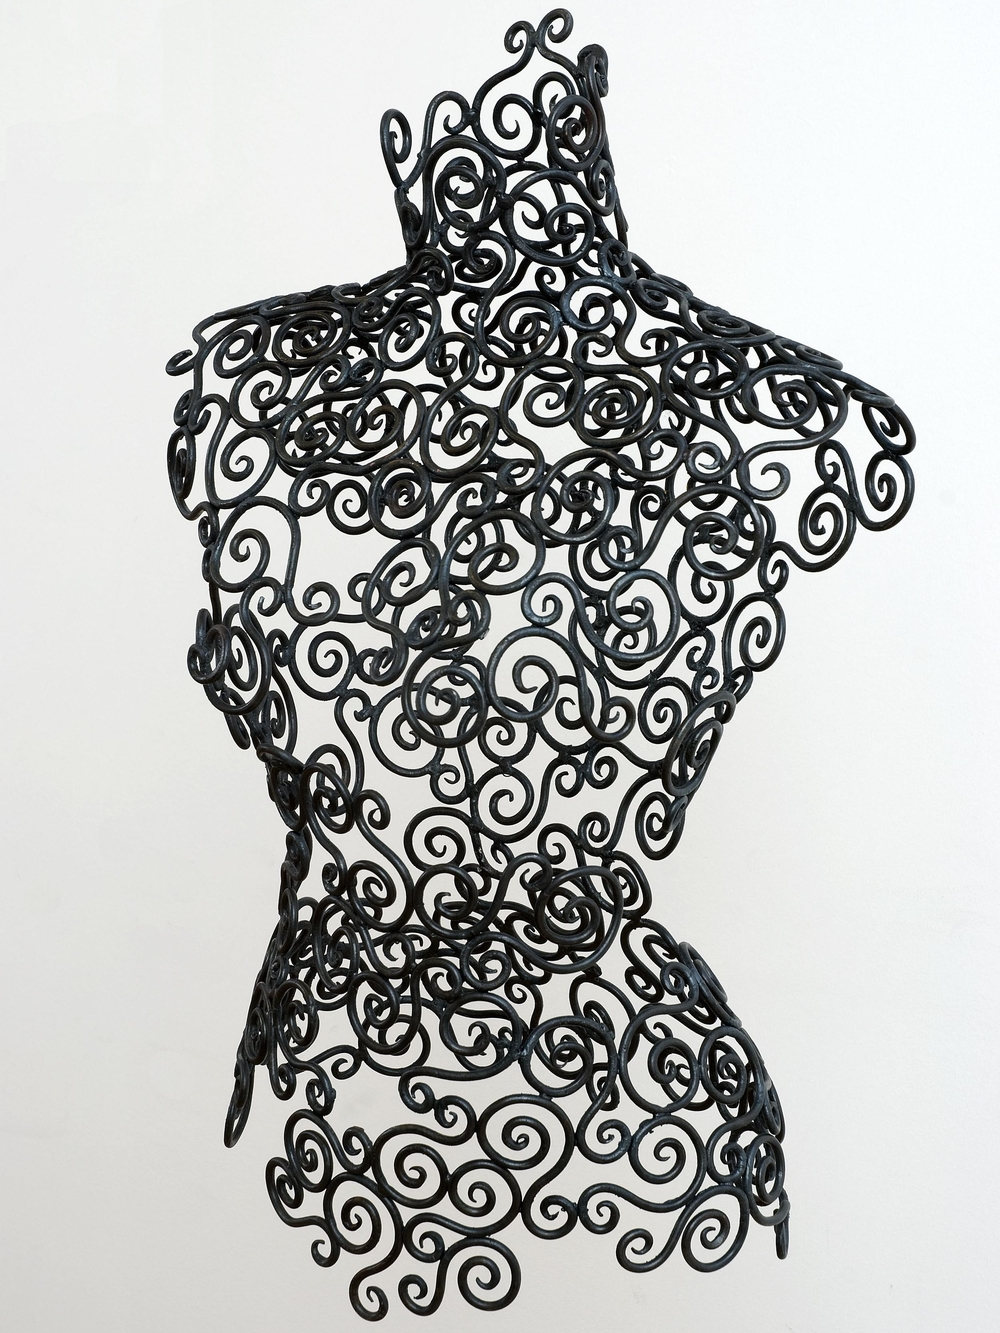 Steel Vest: Kristen Fahrig